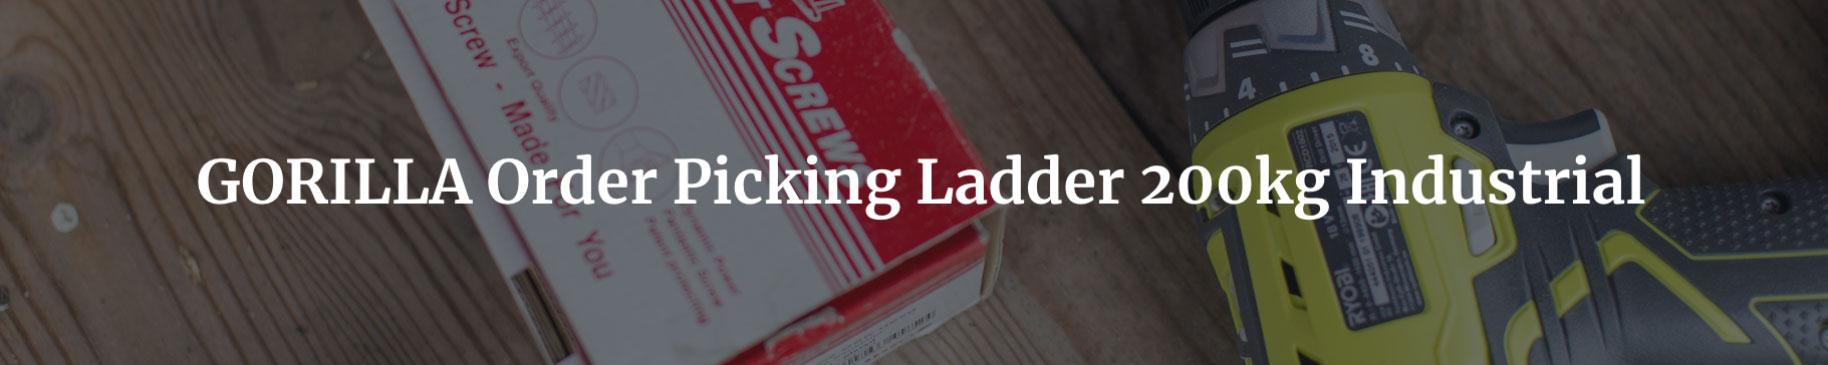 gorilla order picking ladder 200kg industrial headers